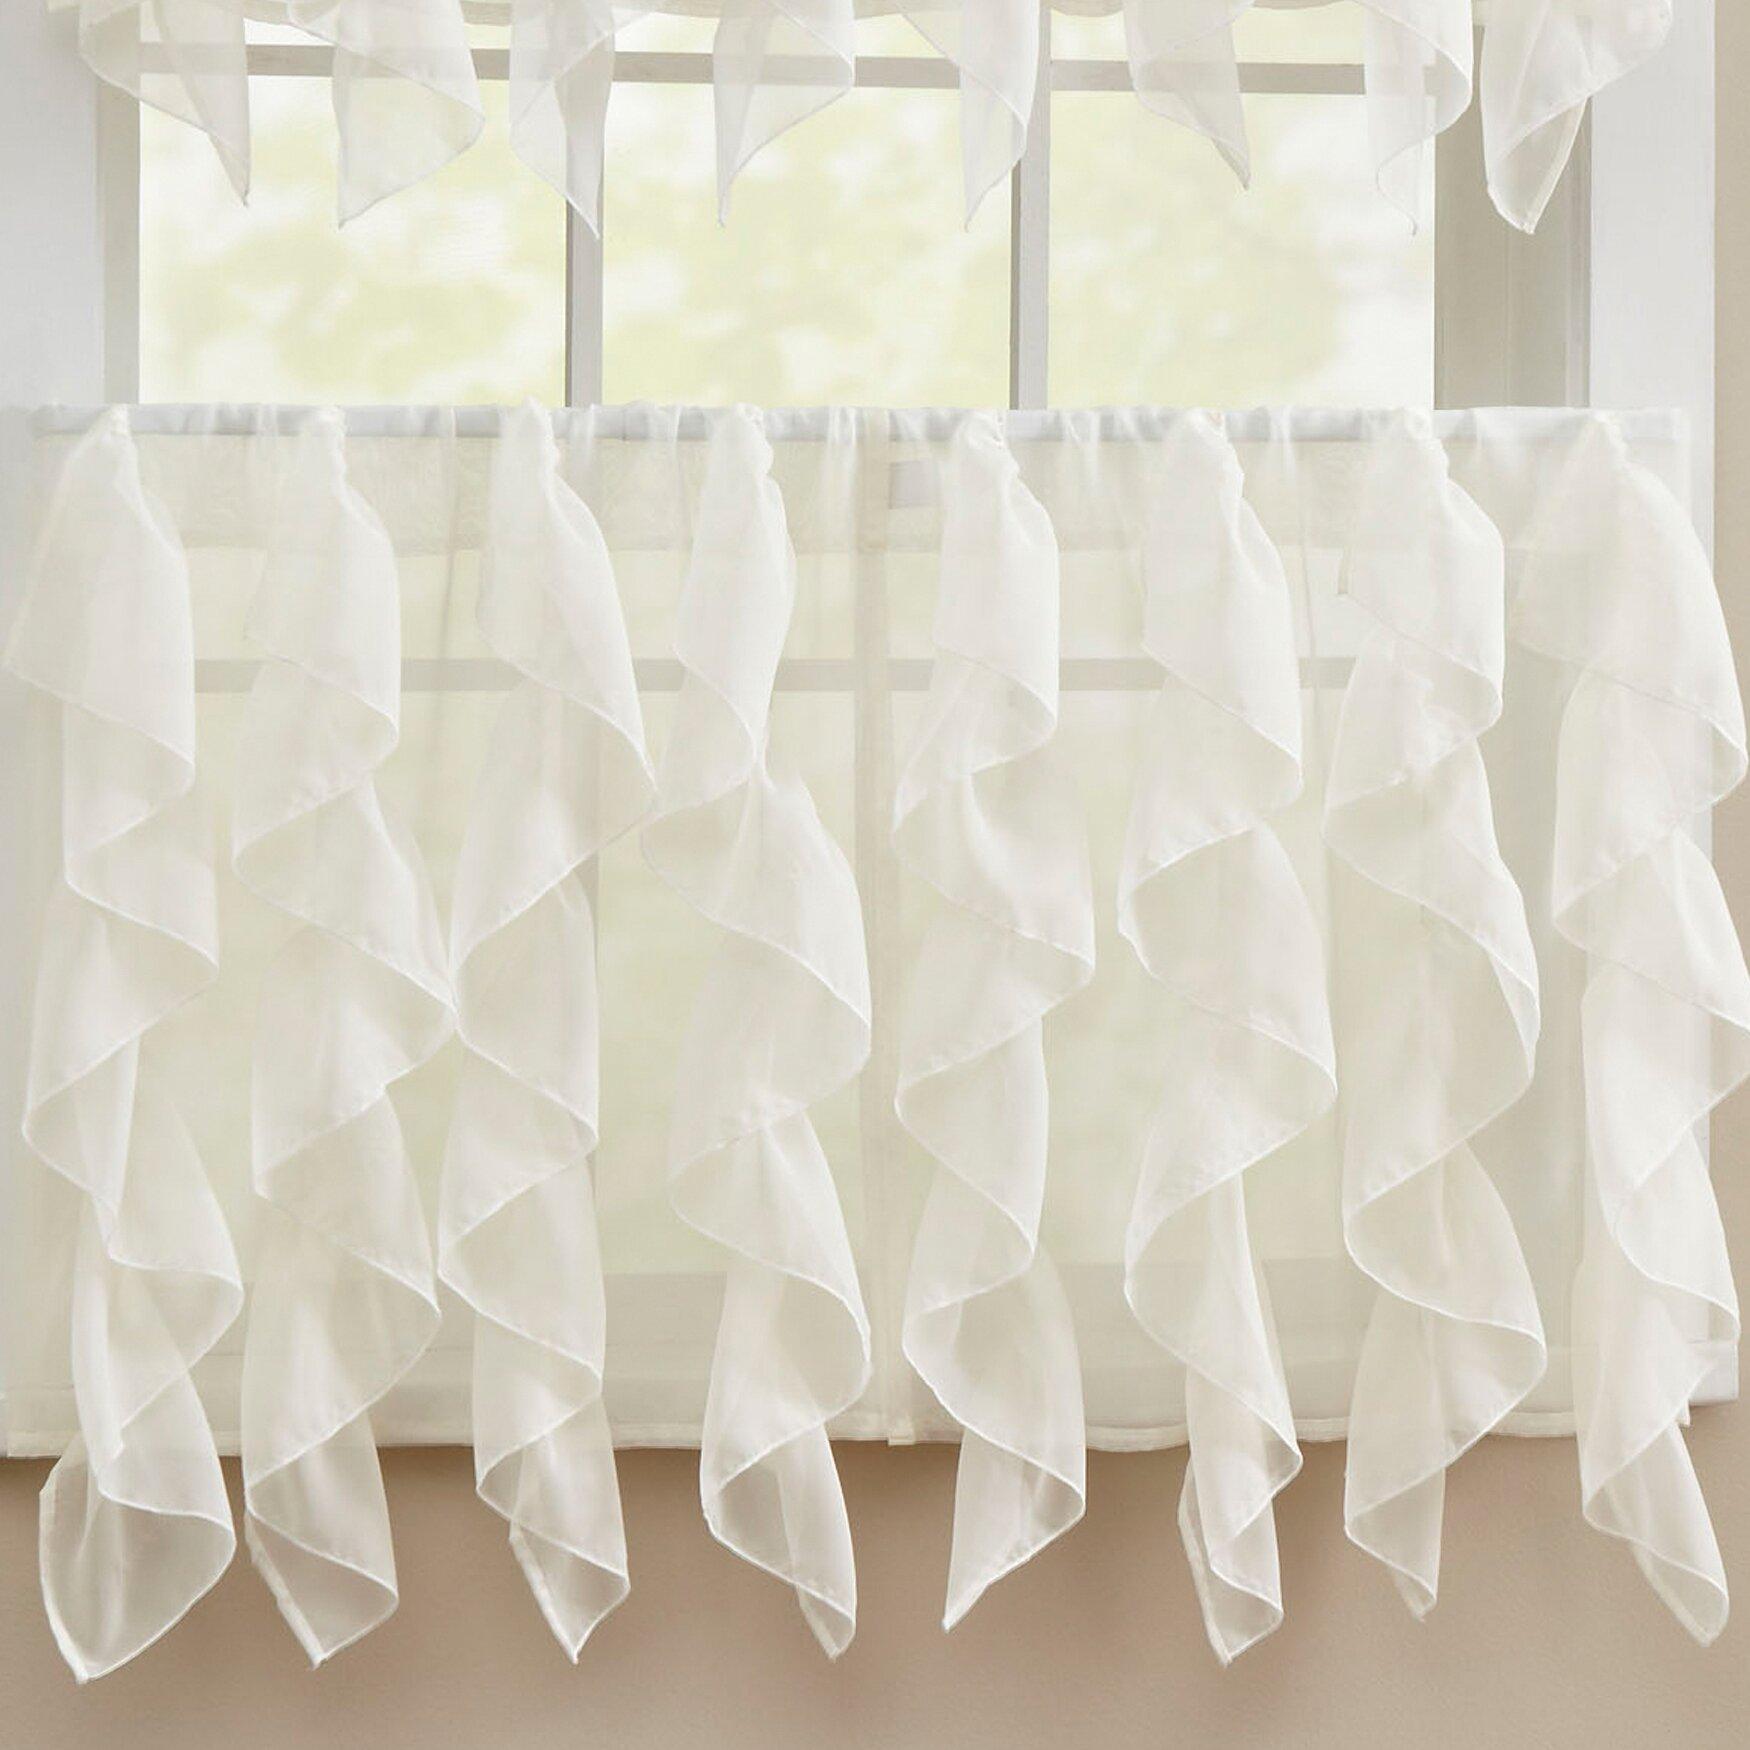 Ruffle window curtain - Chic Sheer Voile Vertical Ruffle Window Kitchen Tier Curtain